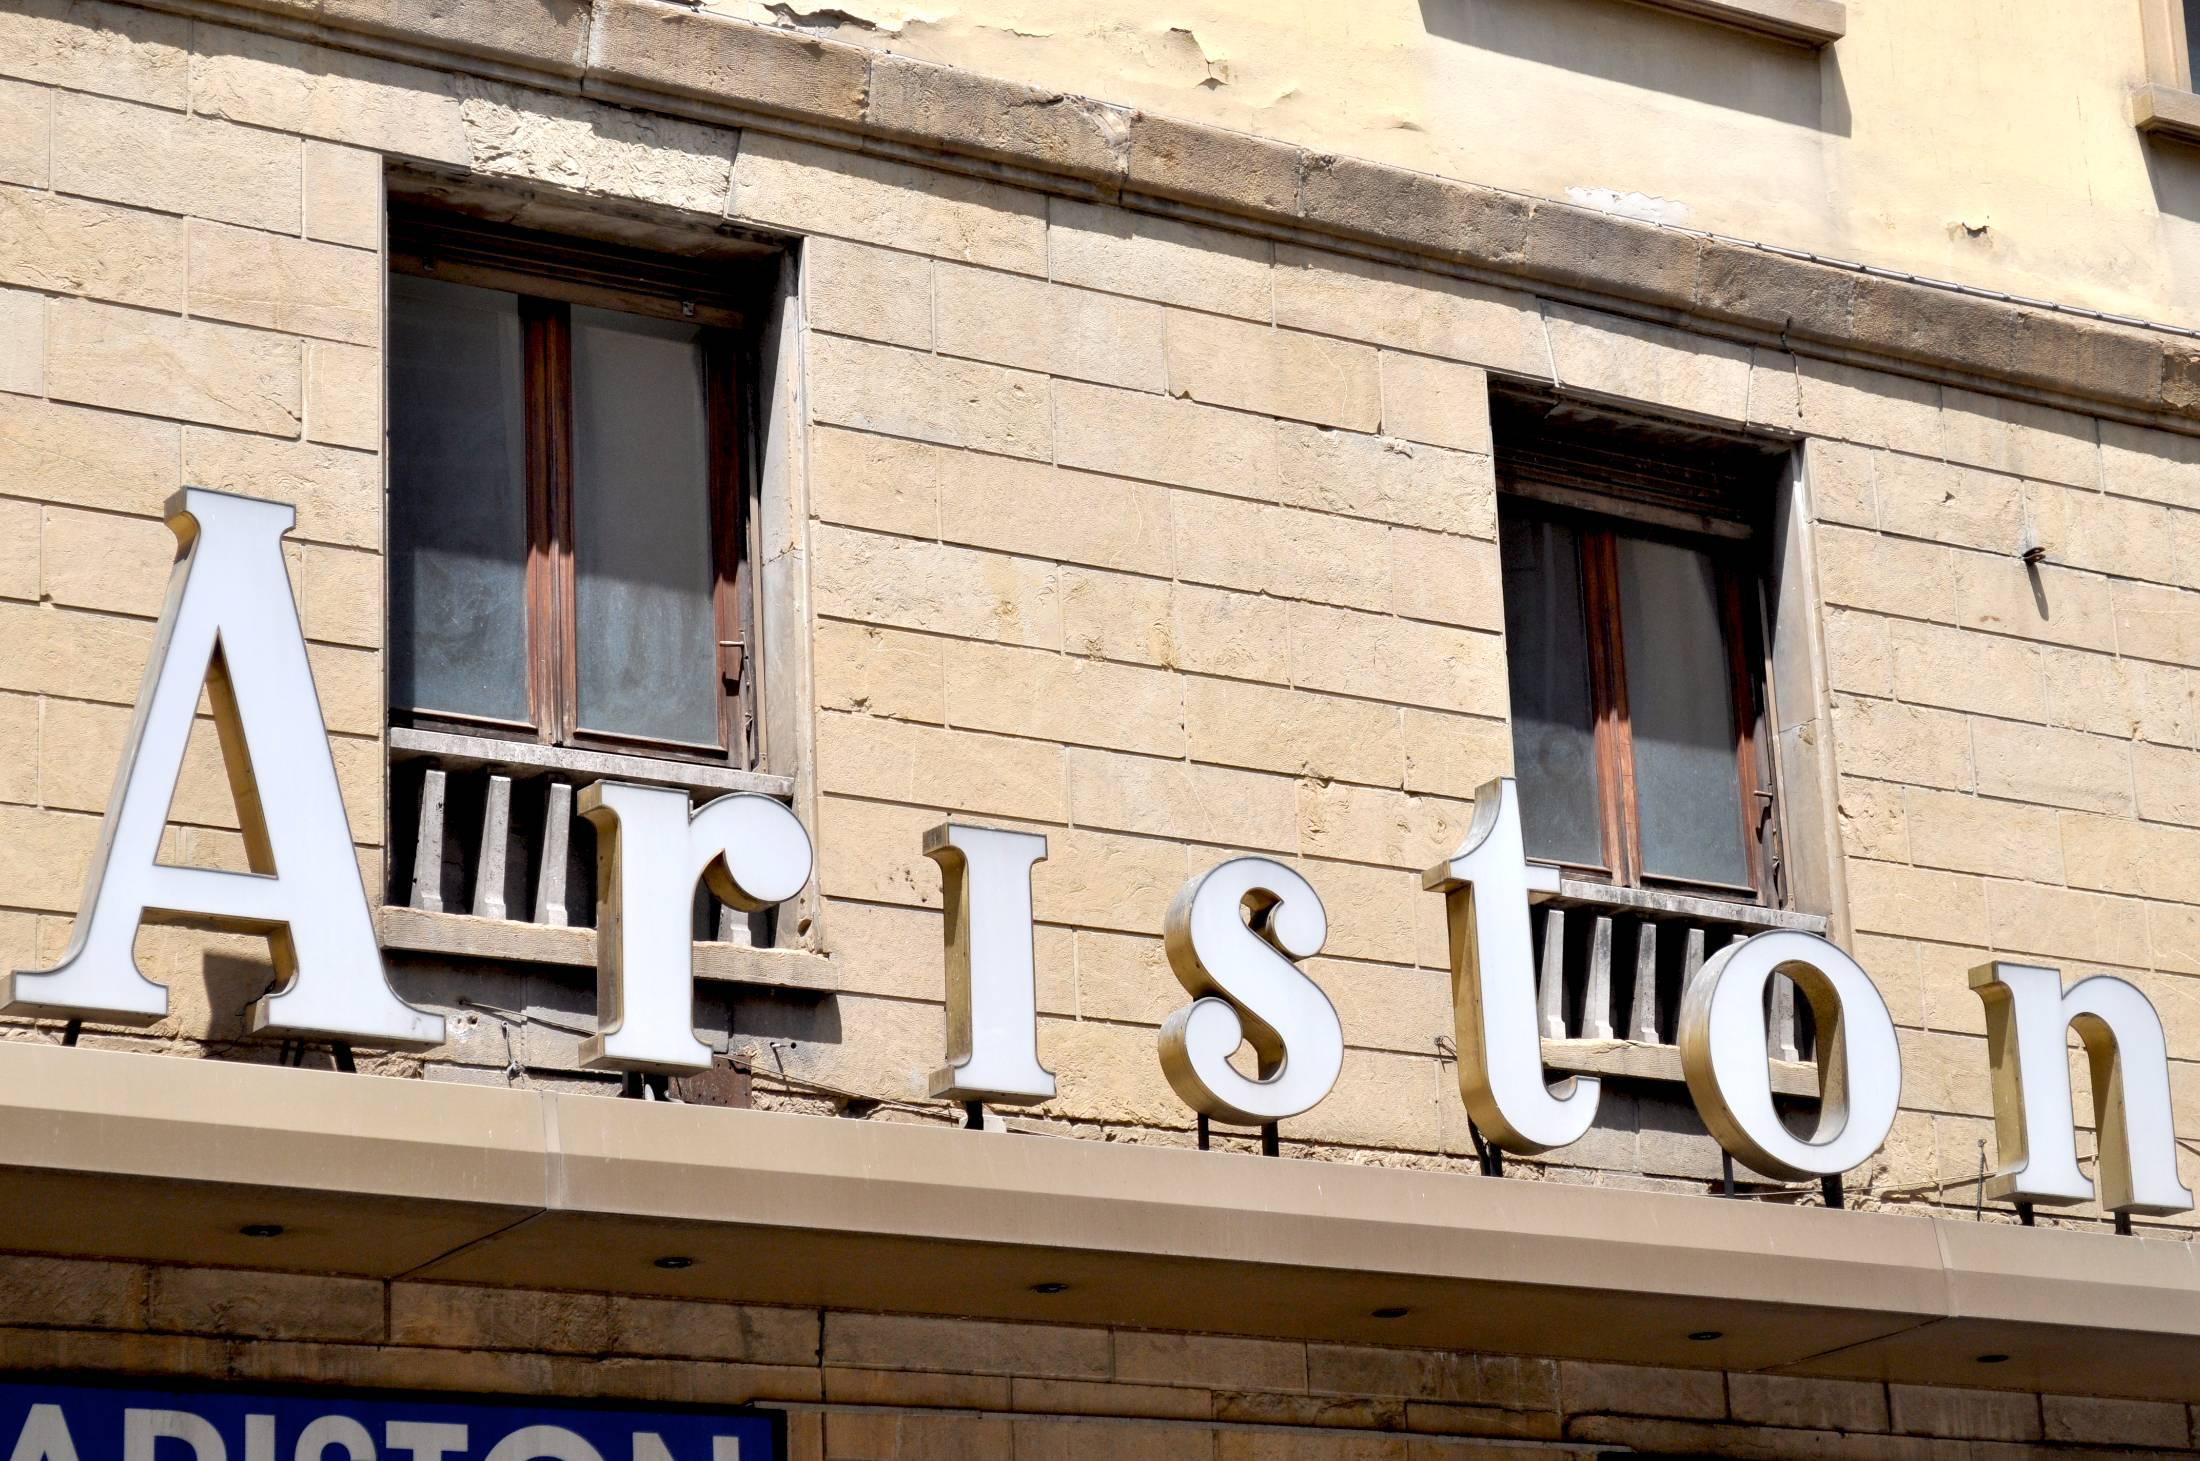 Theatre in Florence, Ariston